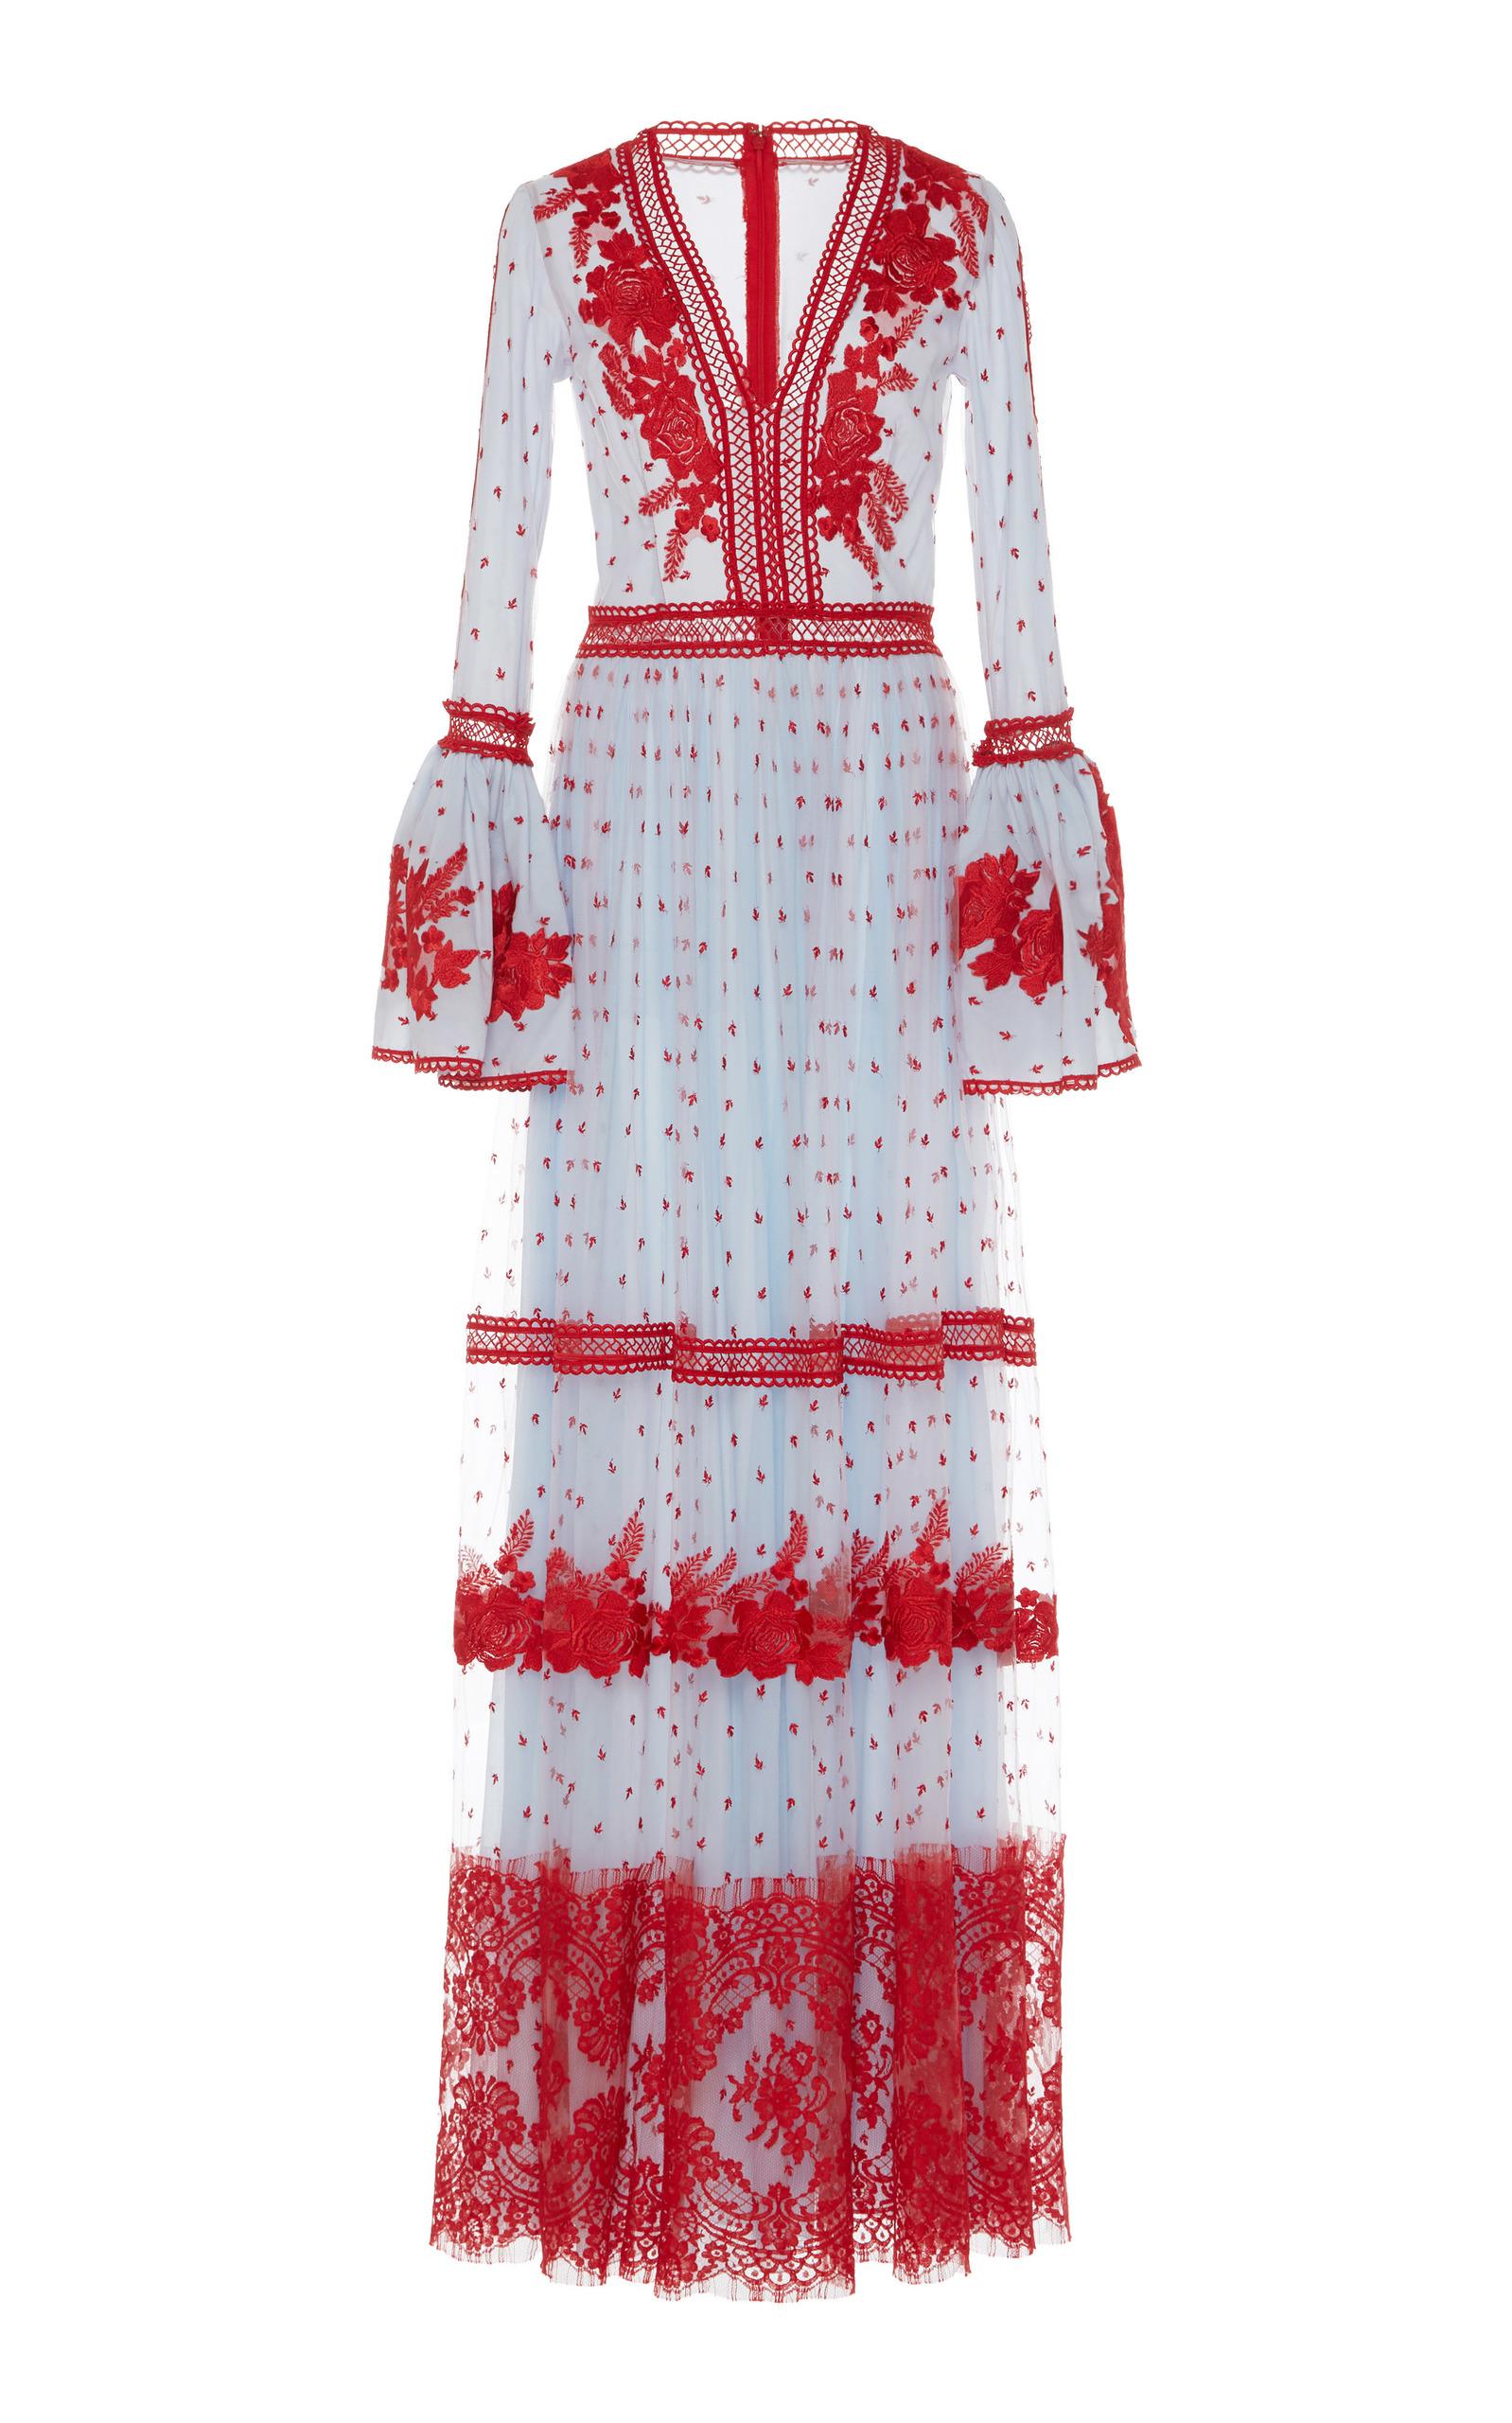 Bell Sleeve Long Dress Costarellos Professional yAeL1XoYaf